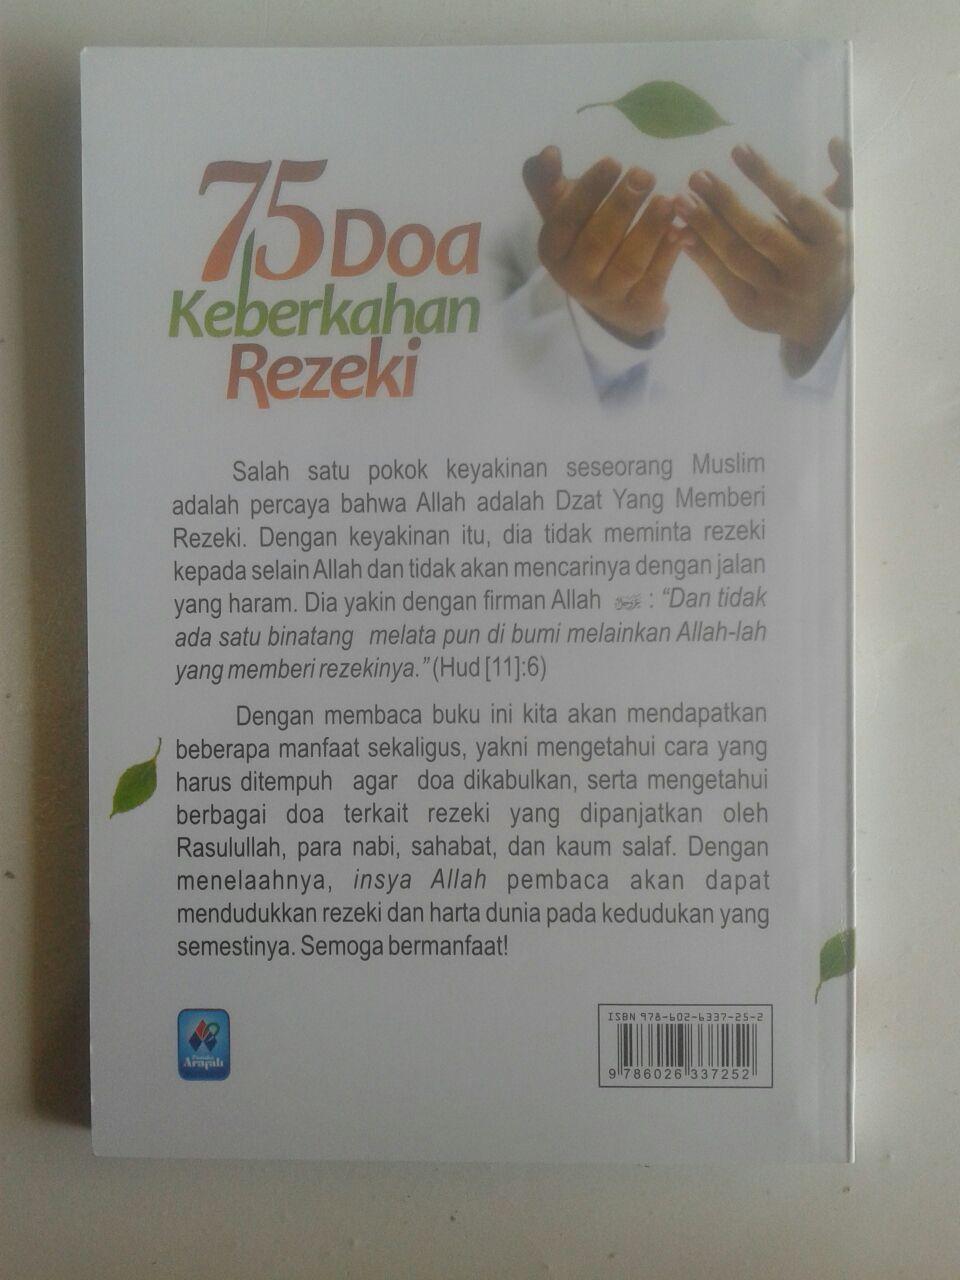 Buku Saku 75 Doa Keberkahan Rezeki cover